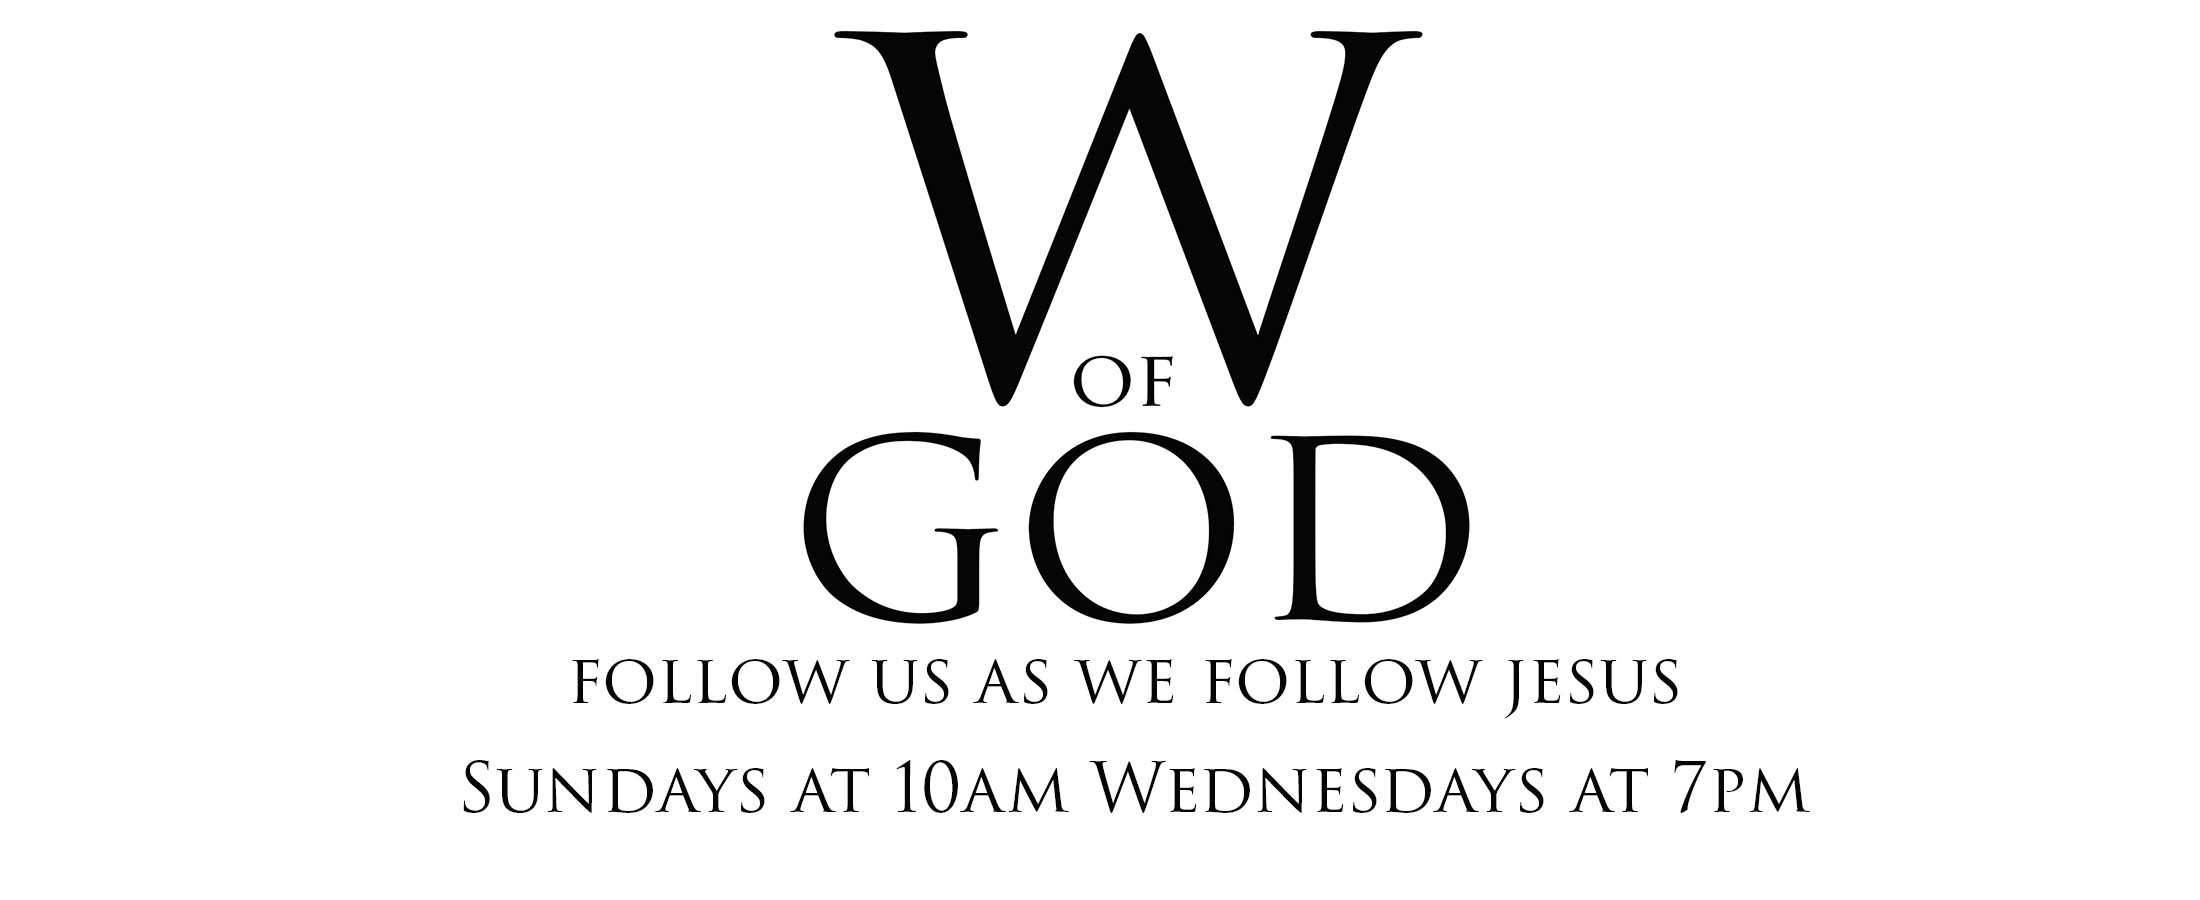 Word of God Fellowship Christian Church Raleigh NC 27610